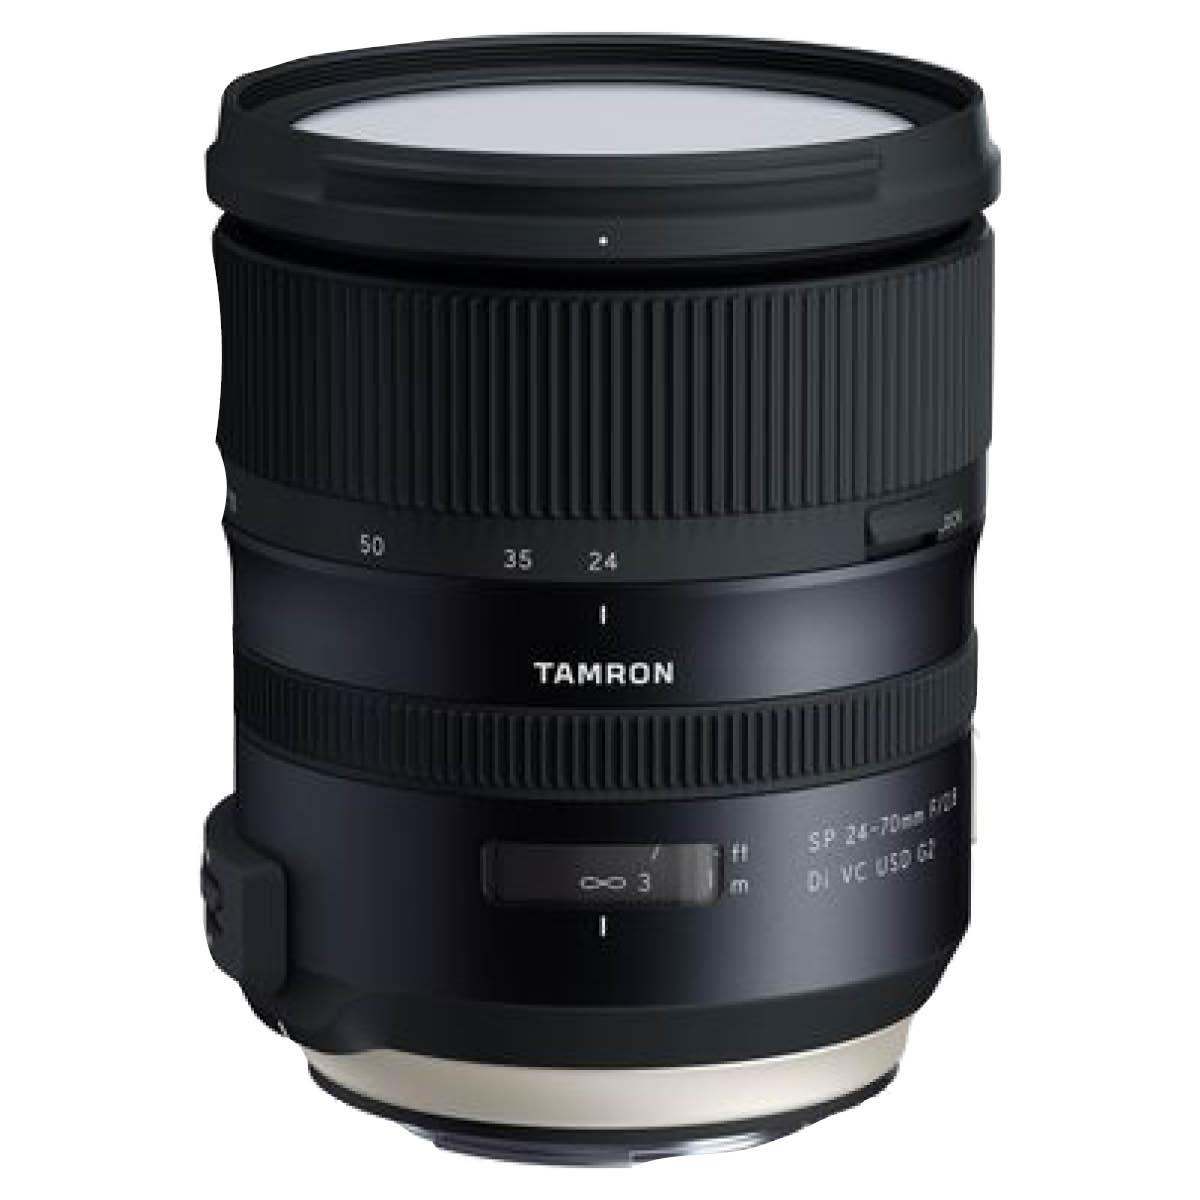 Tamron 24-70 mm 1:2,8 DI VC USD G2 FX